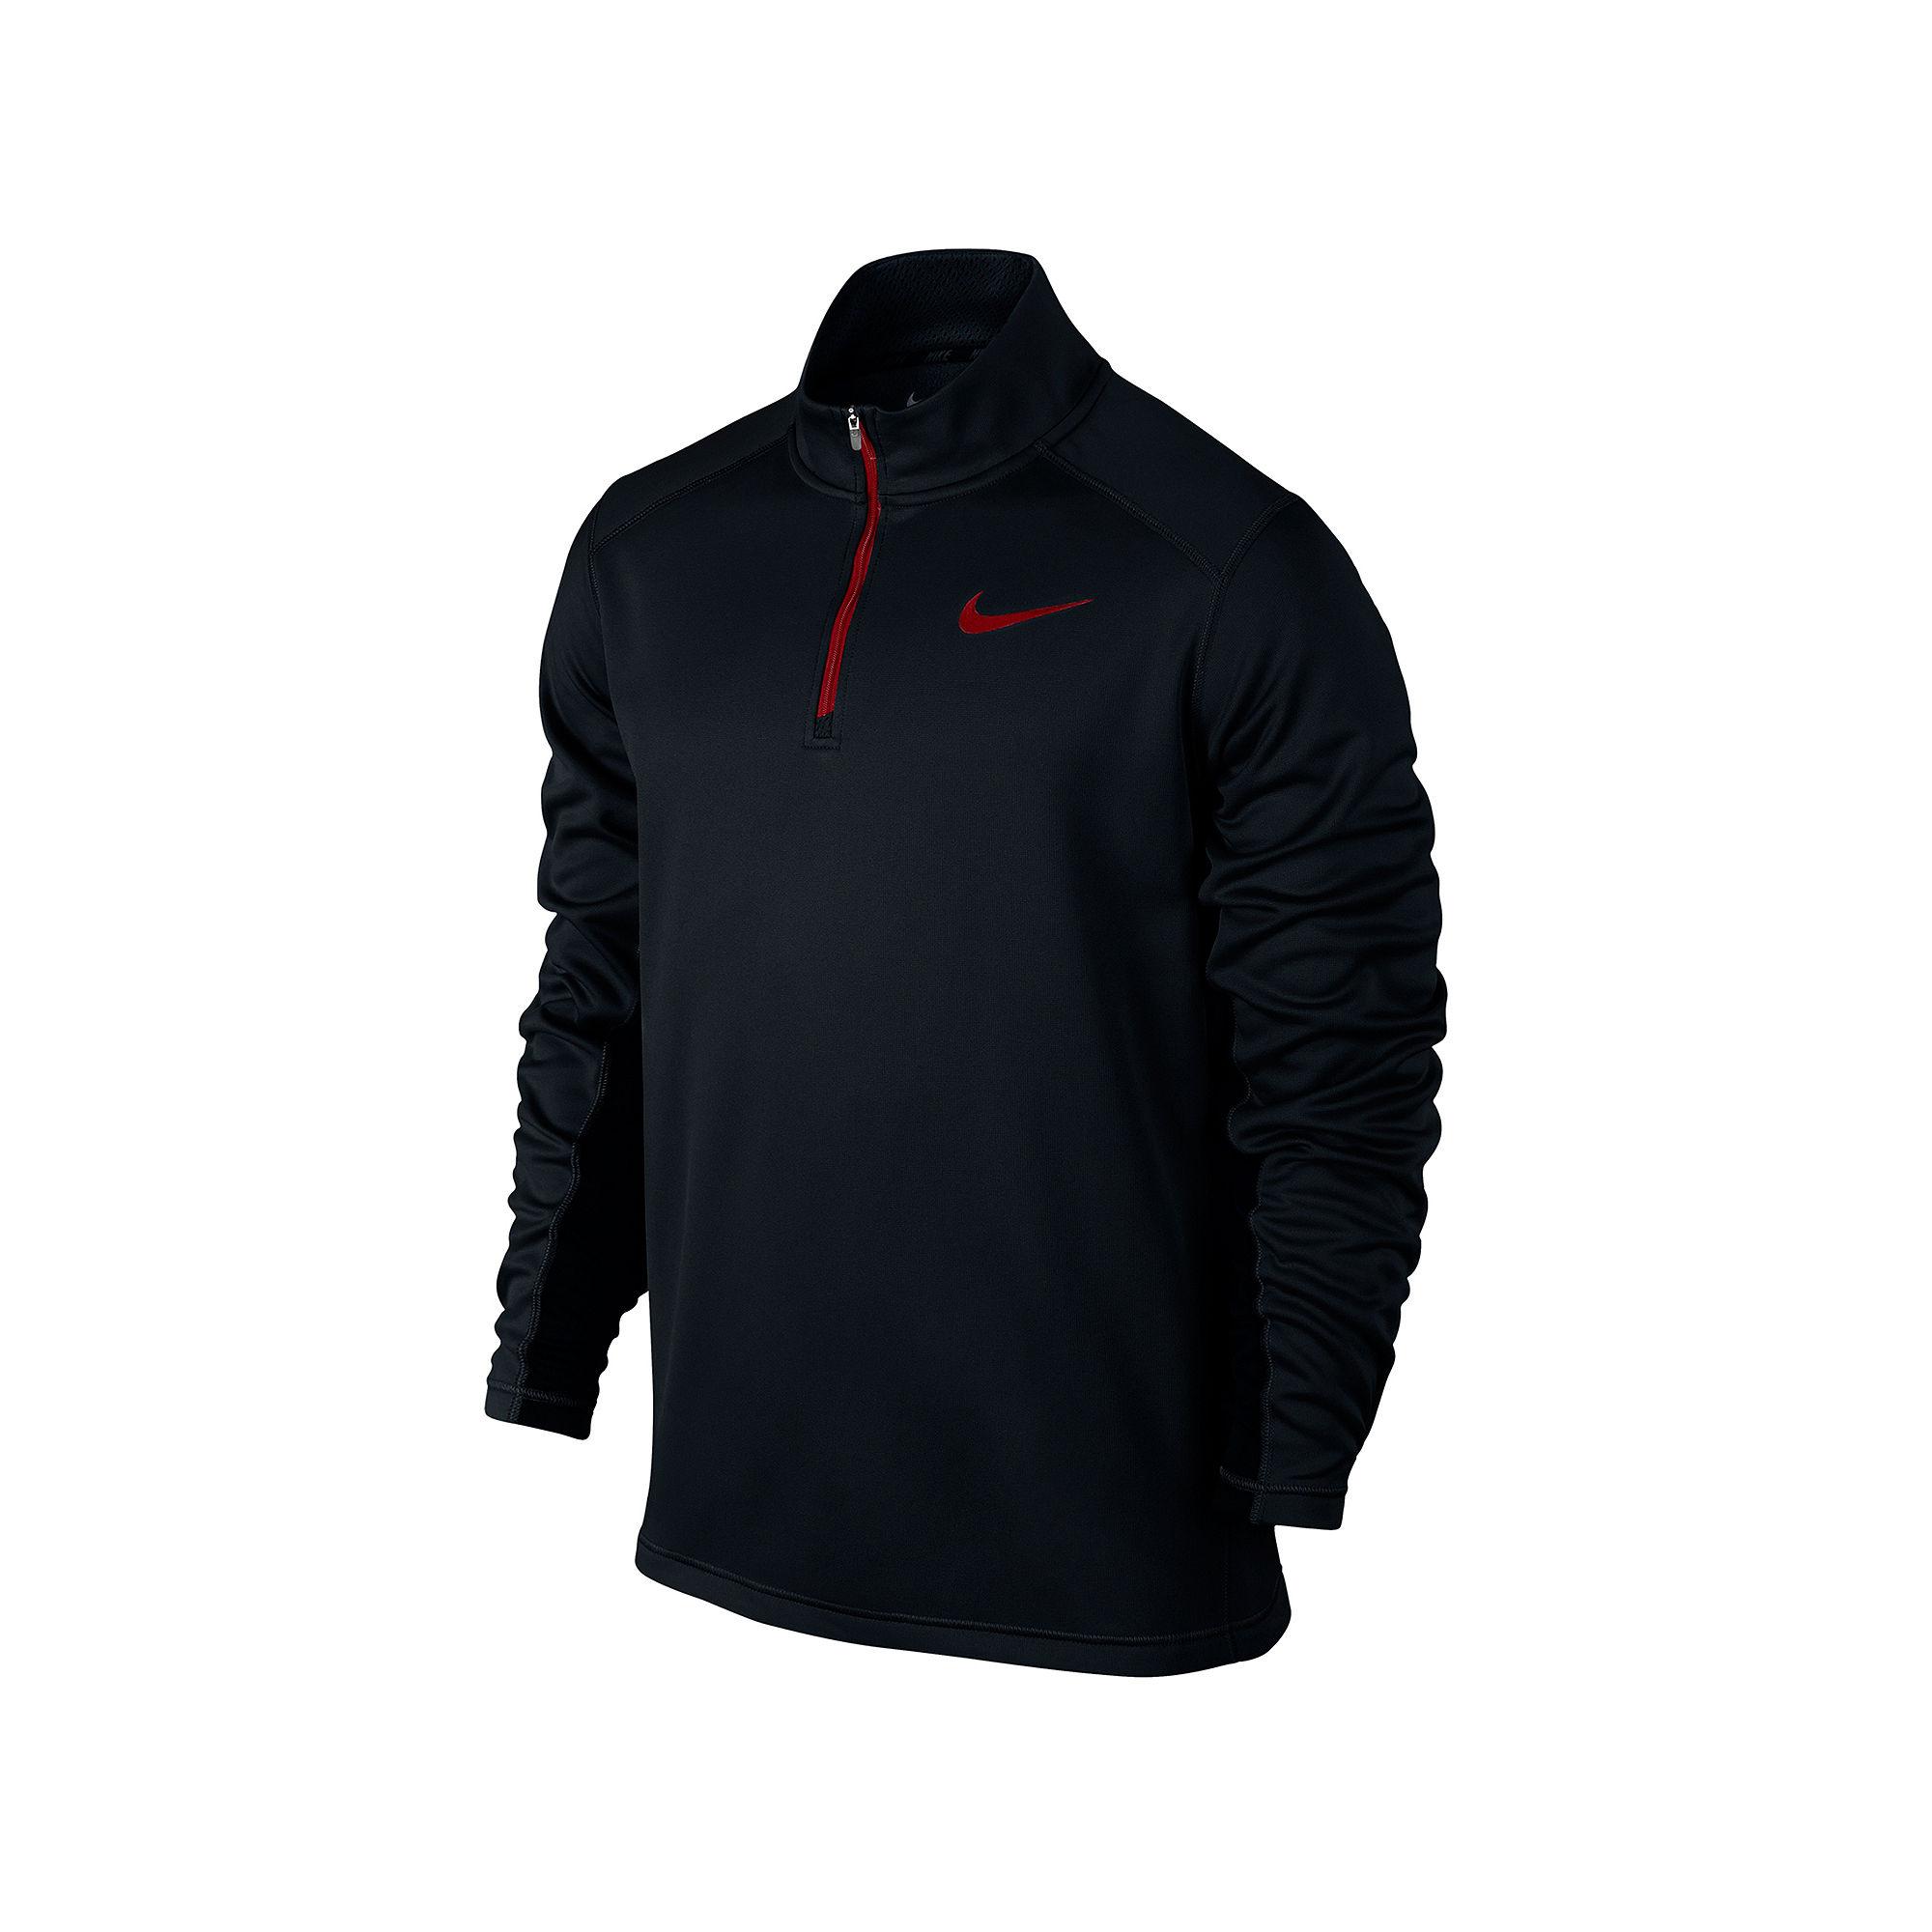 UPC 888408907684 product image for Men's Nike KO 1/4 Zip Top Black/Gym UPC  888408907684 product image for Nike KO Quarter-Zip Fleece Sweatshirt ...